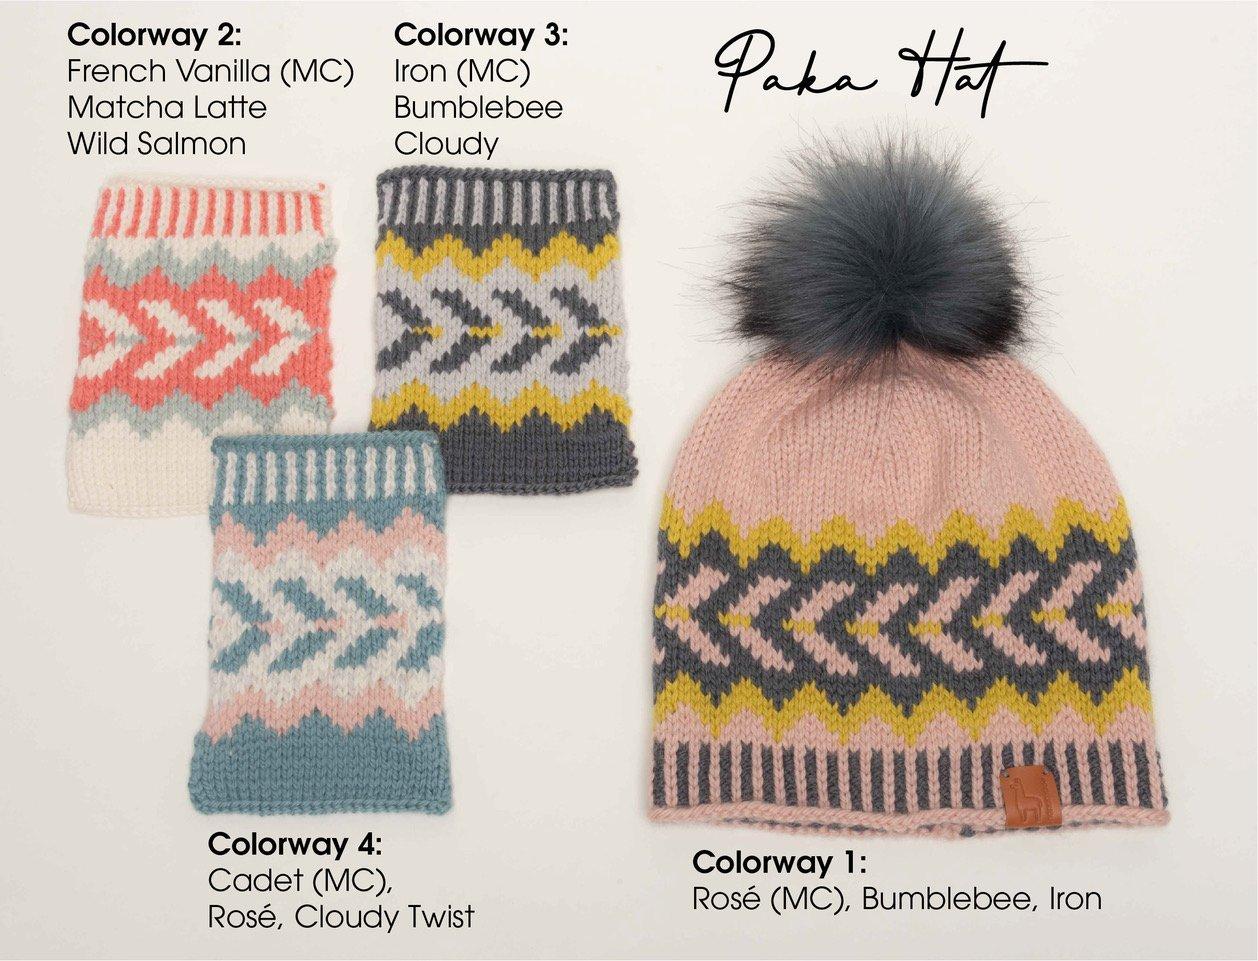 Ikigai Paka Hat Kit Without Pom Pom - Color Way 3 - Iron